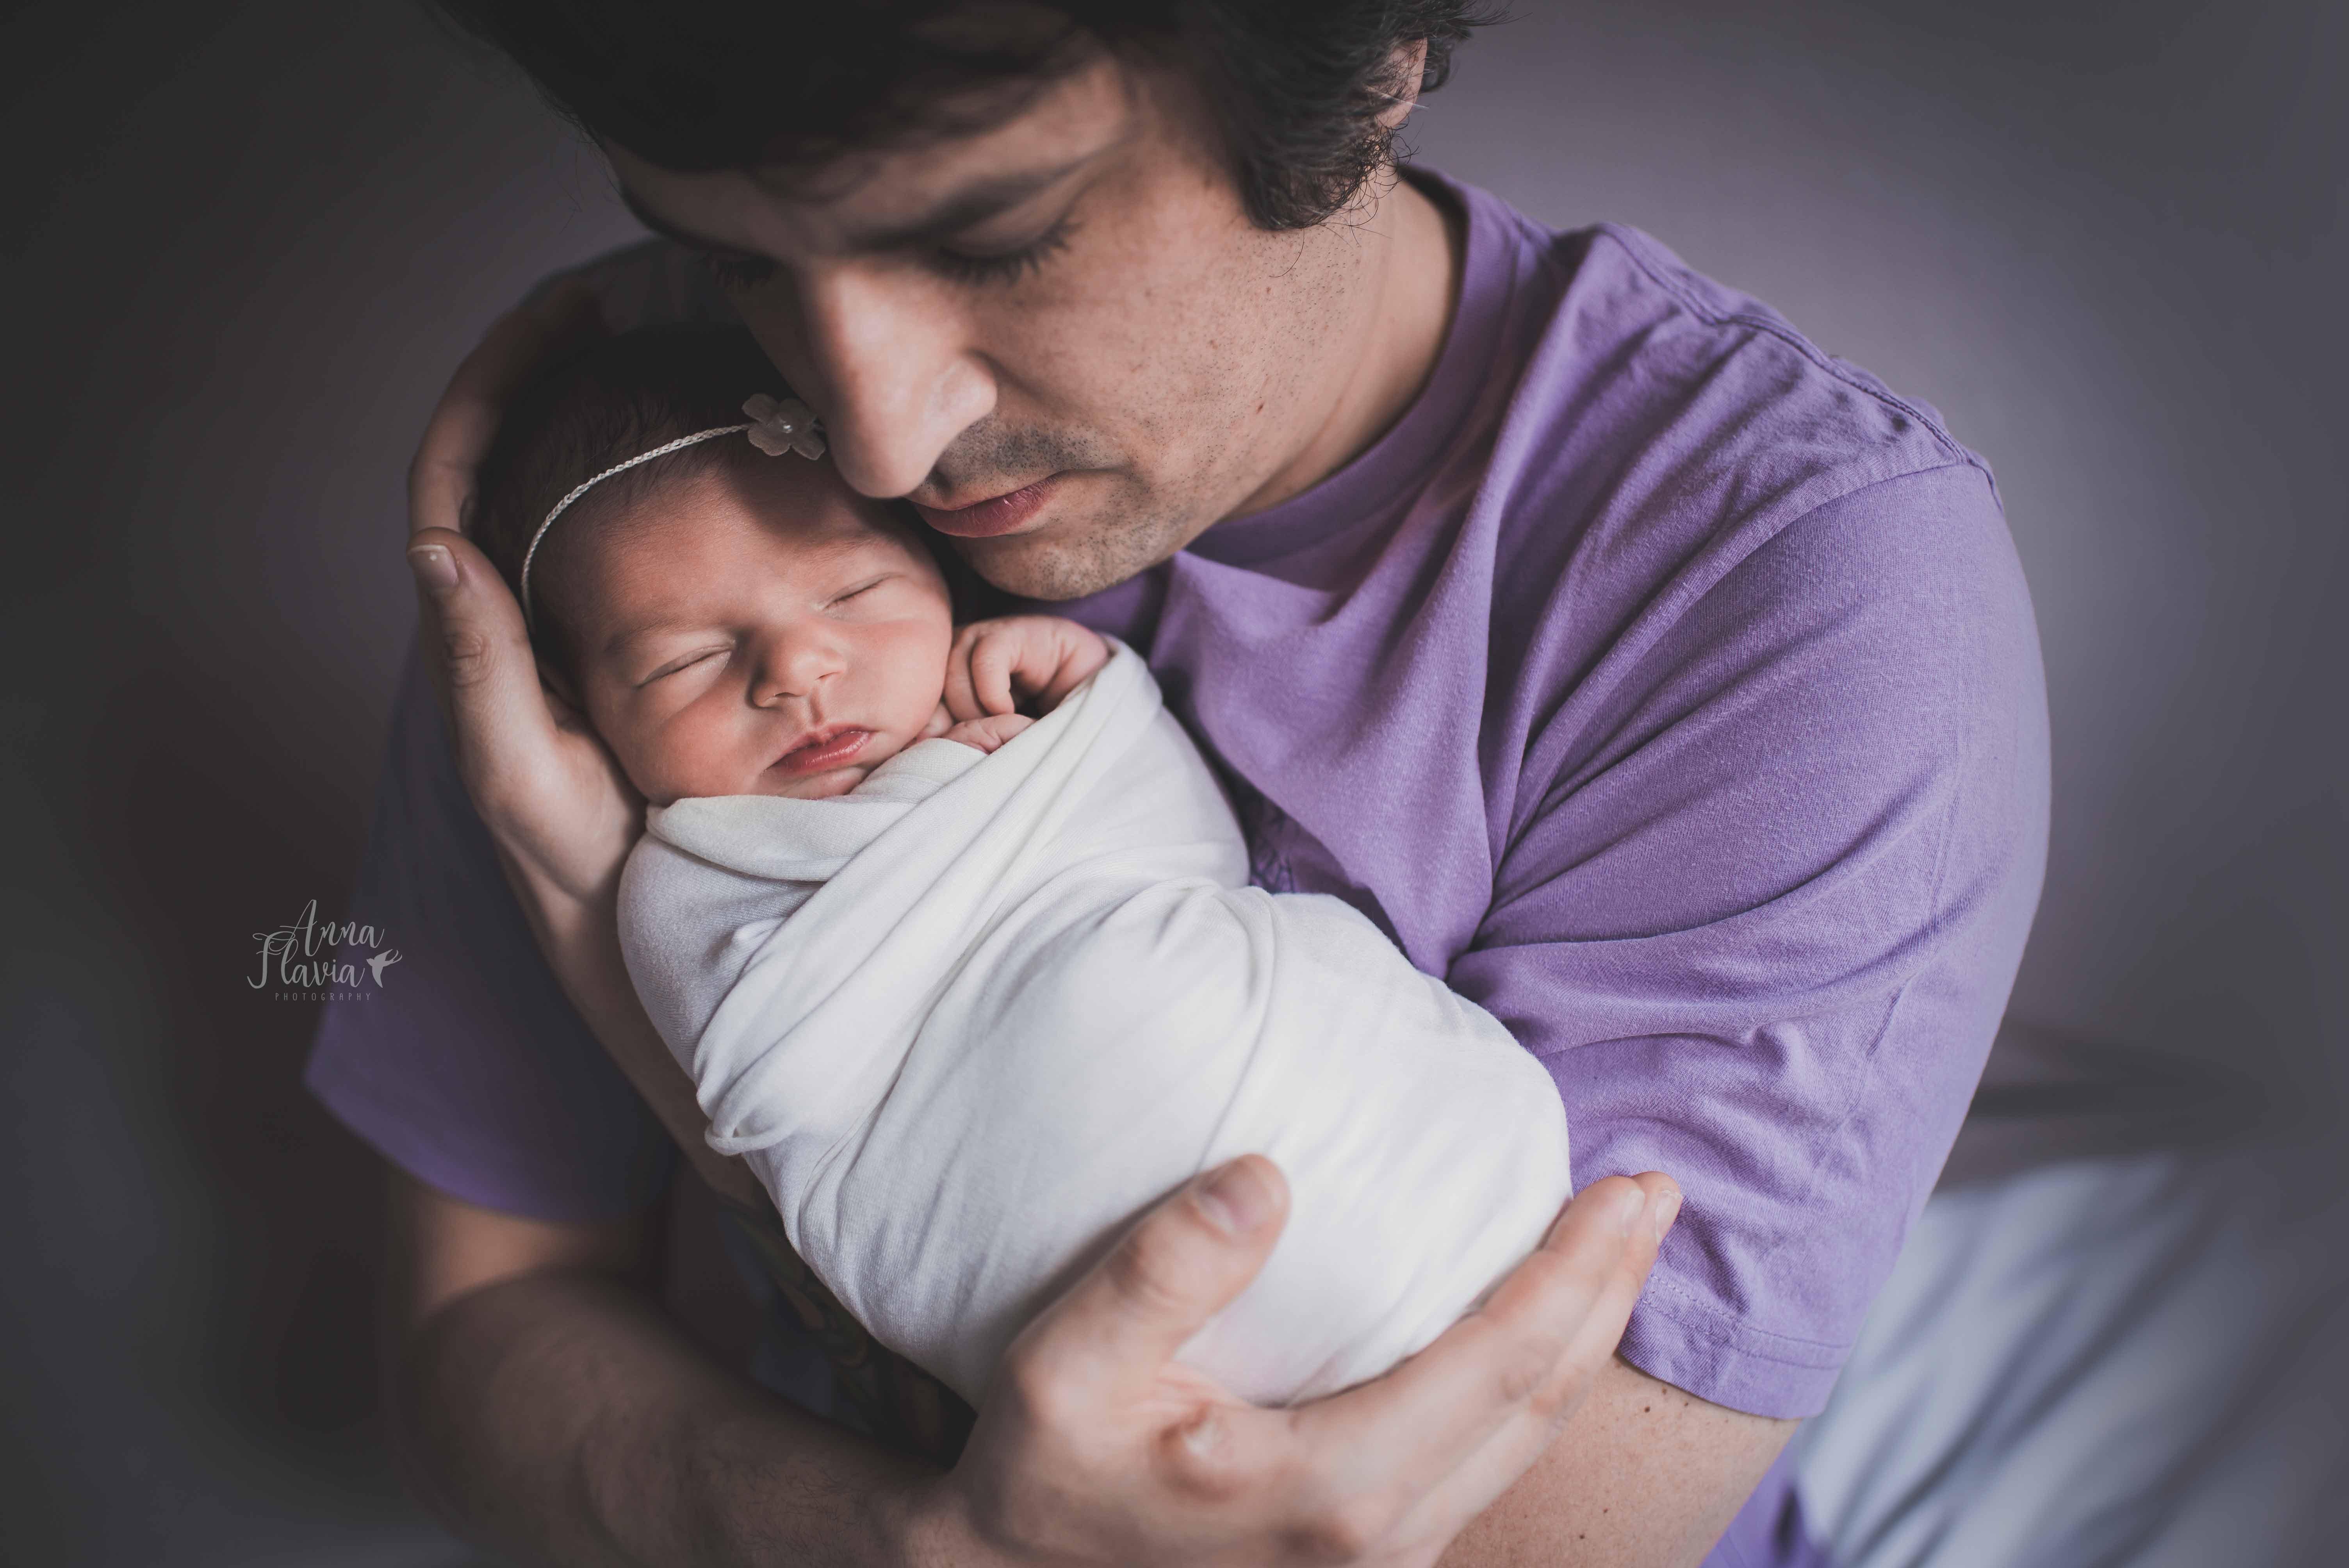 photographer_dublin_anna_flavia_newborn_maternity_12